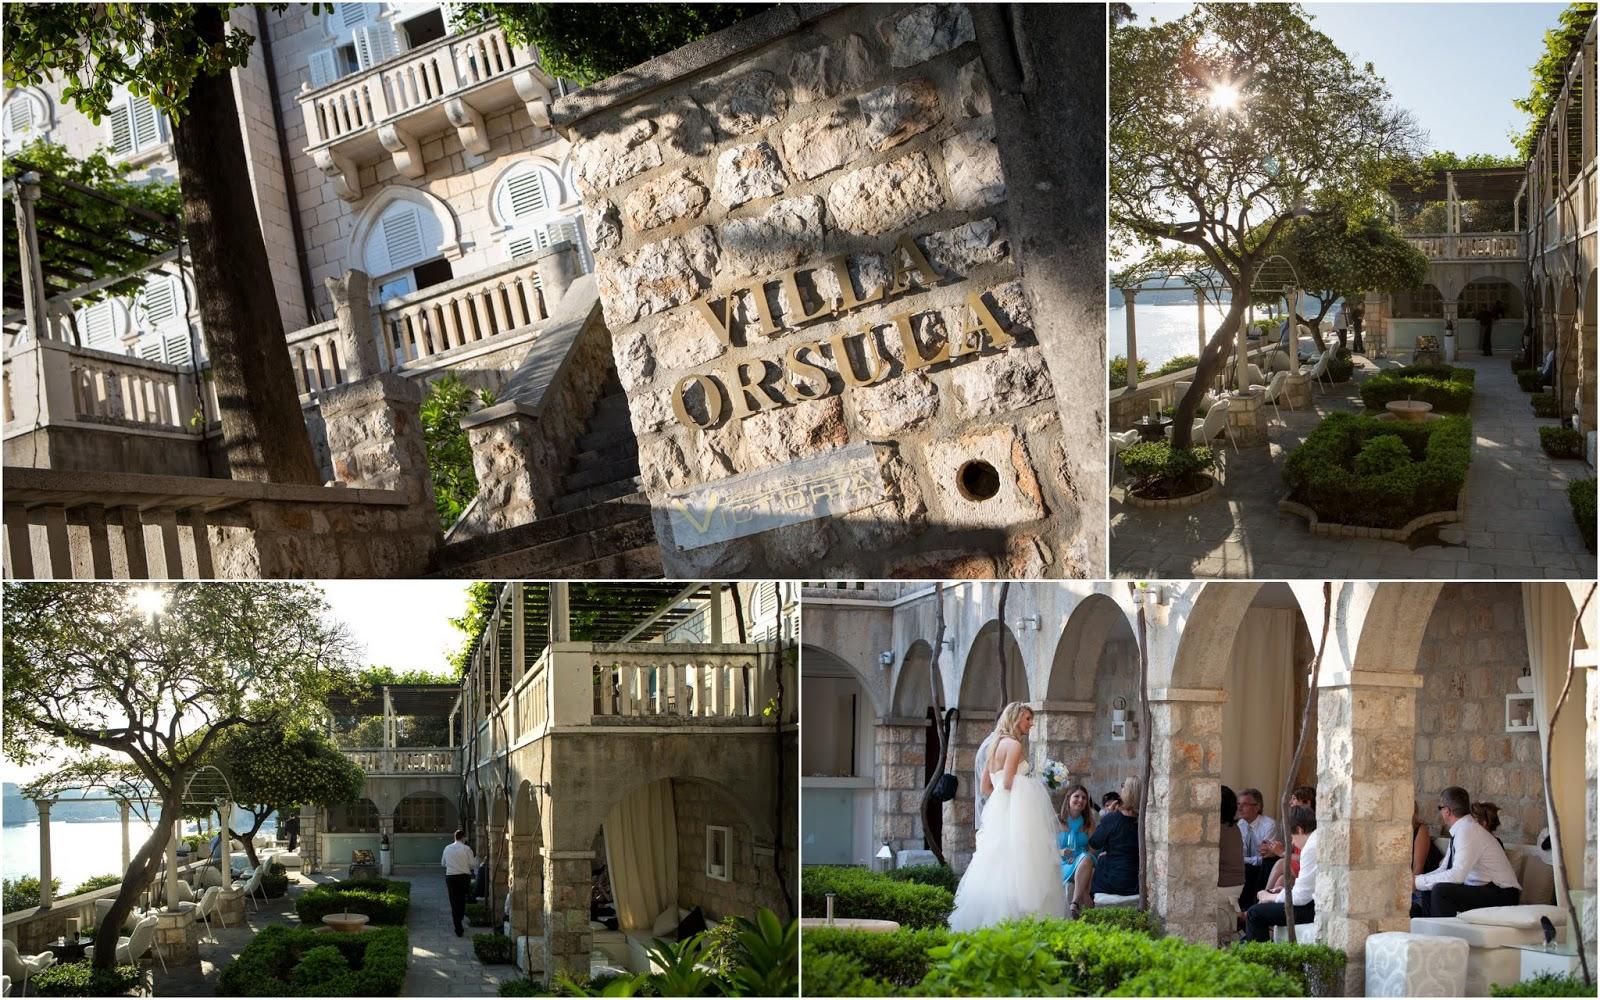 Villa Orsula in Dubrovnik, Croatia